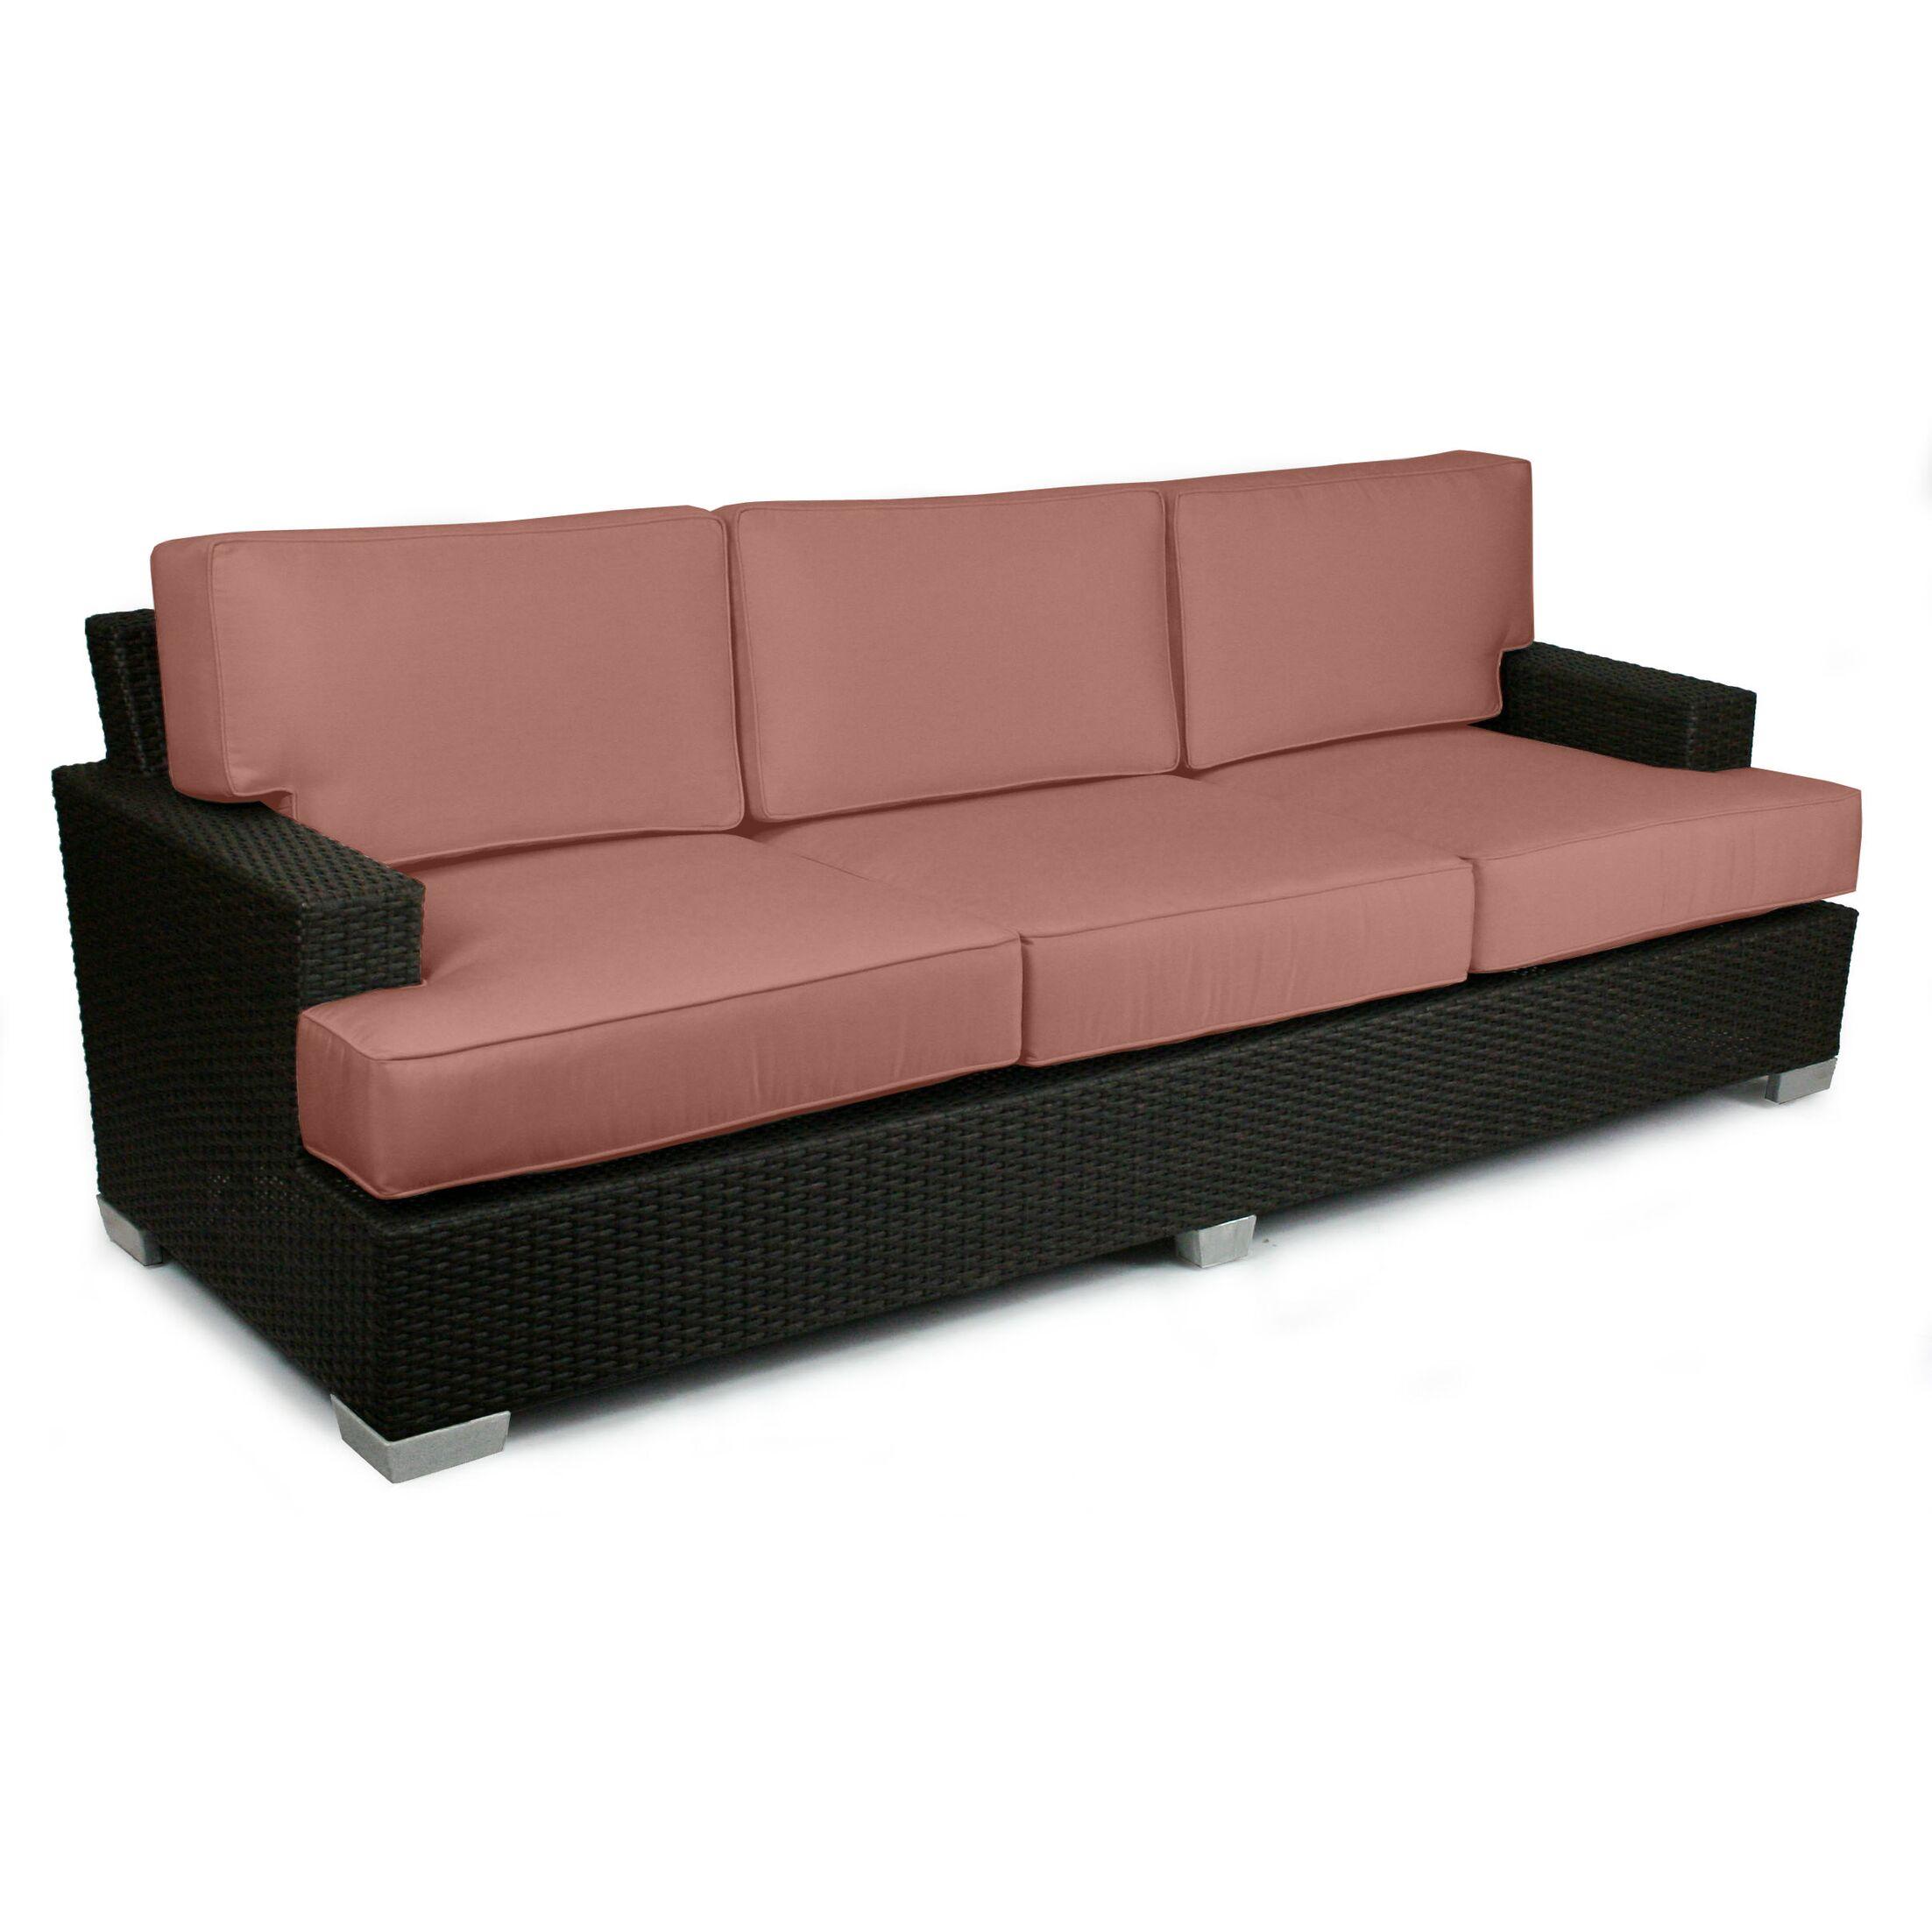 Signature Sofa with Cushions Fabric: Grenadine